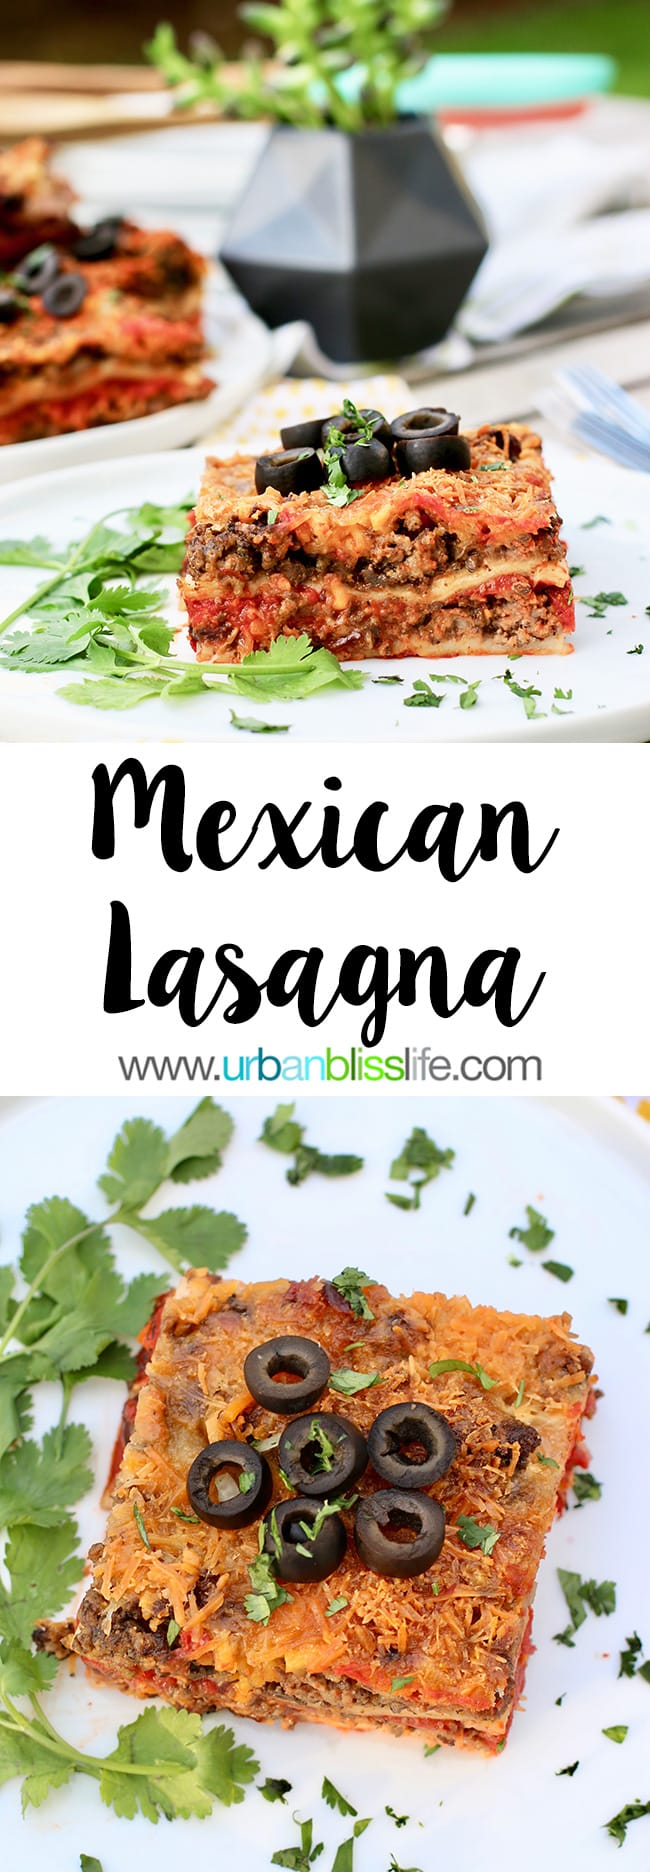 Mexican Lasagna recipe on UrbanBlissLife.com